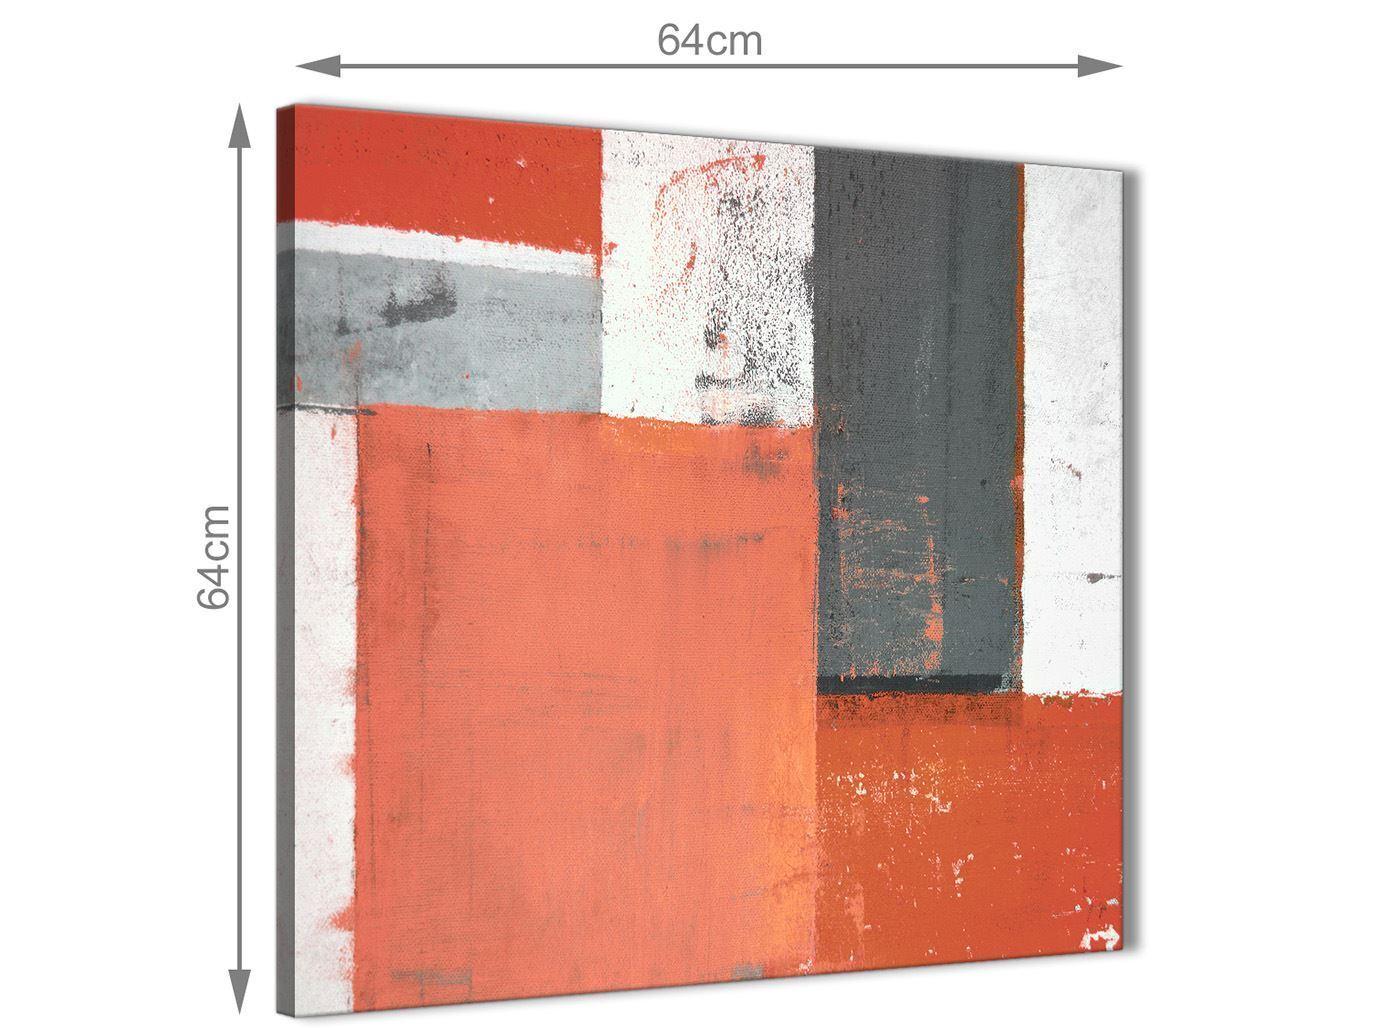 Coral Grigio Pittura Astratta Tela Tela Tela arte FOTO-Moderno Quadrato 64 cm - 1s336m db8074